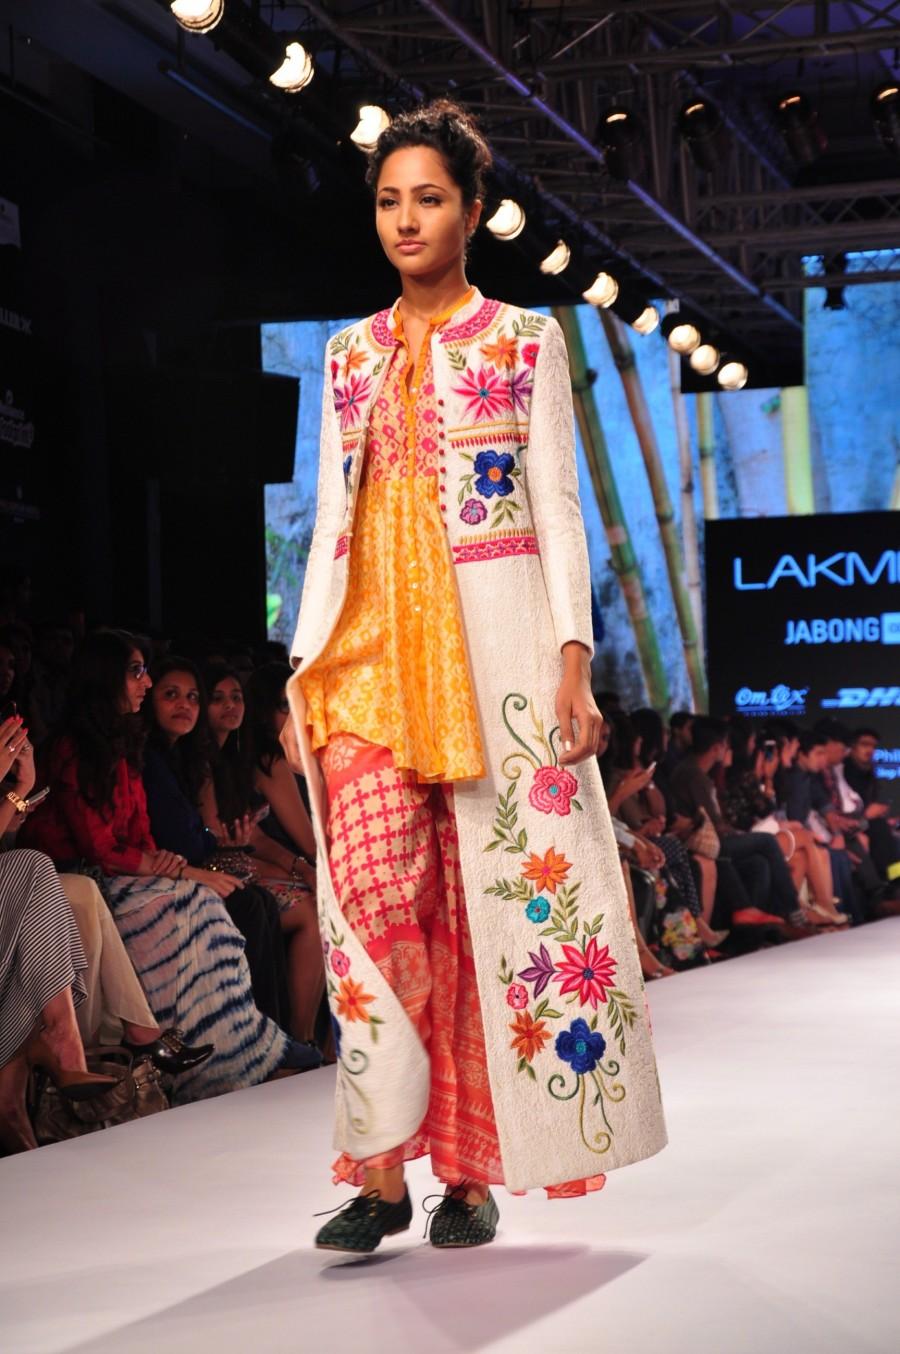 Lakme Fashion Week 2015,LFW2015,#LakmeFashionWeek,manish malhotra,designers,day 1,night show,fashion show,blue runway,photos